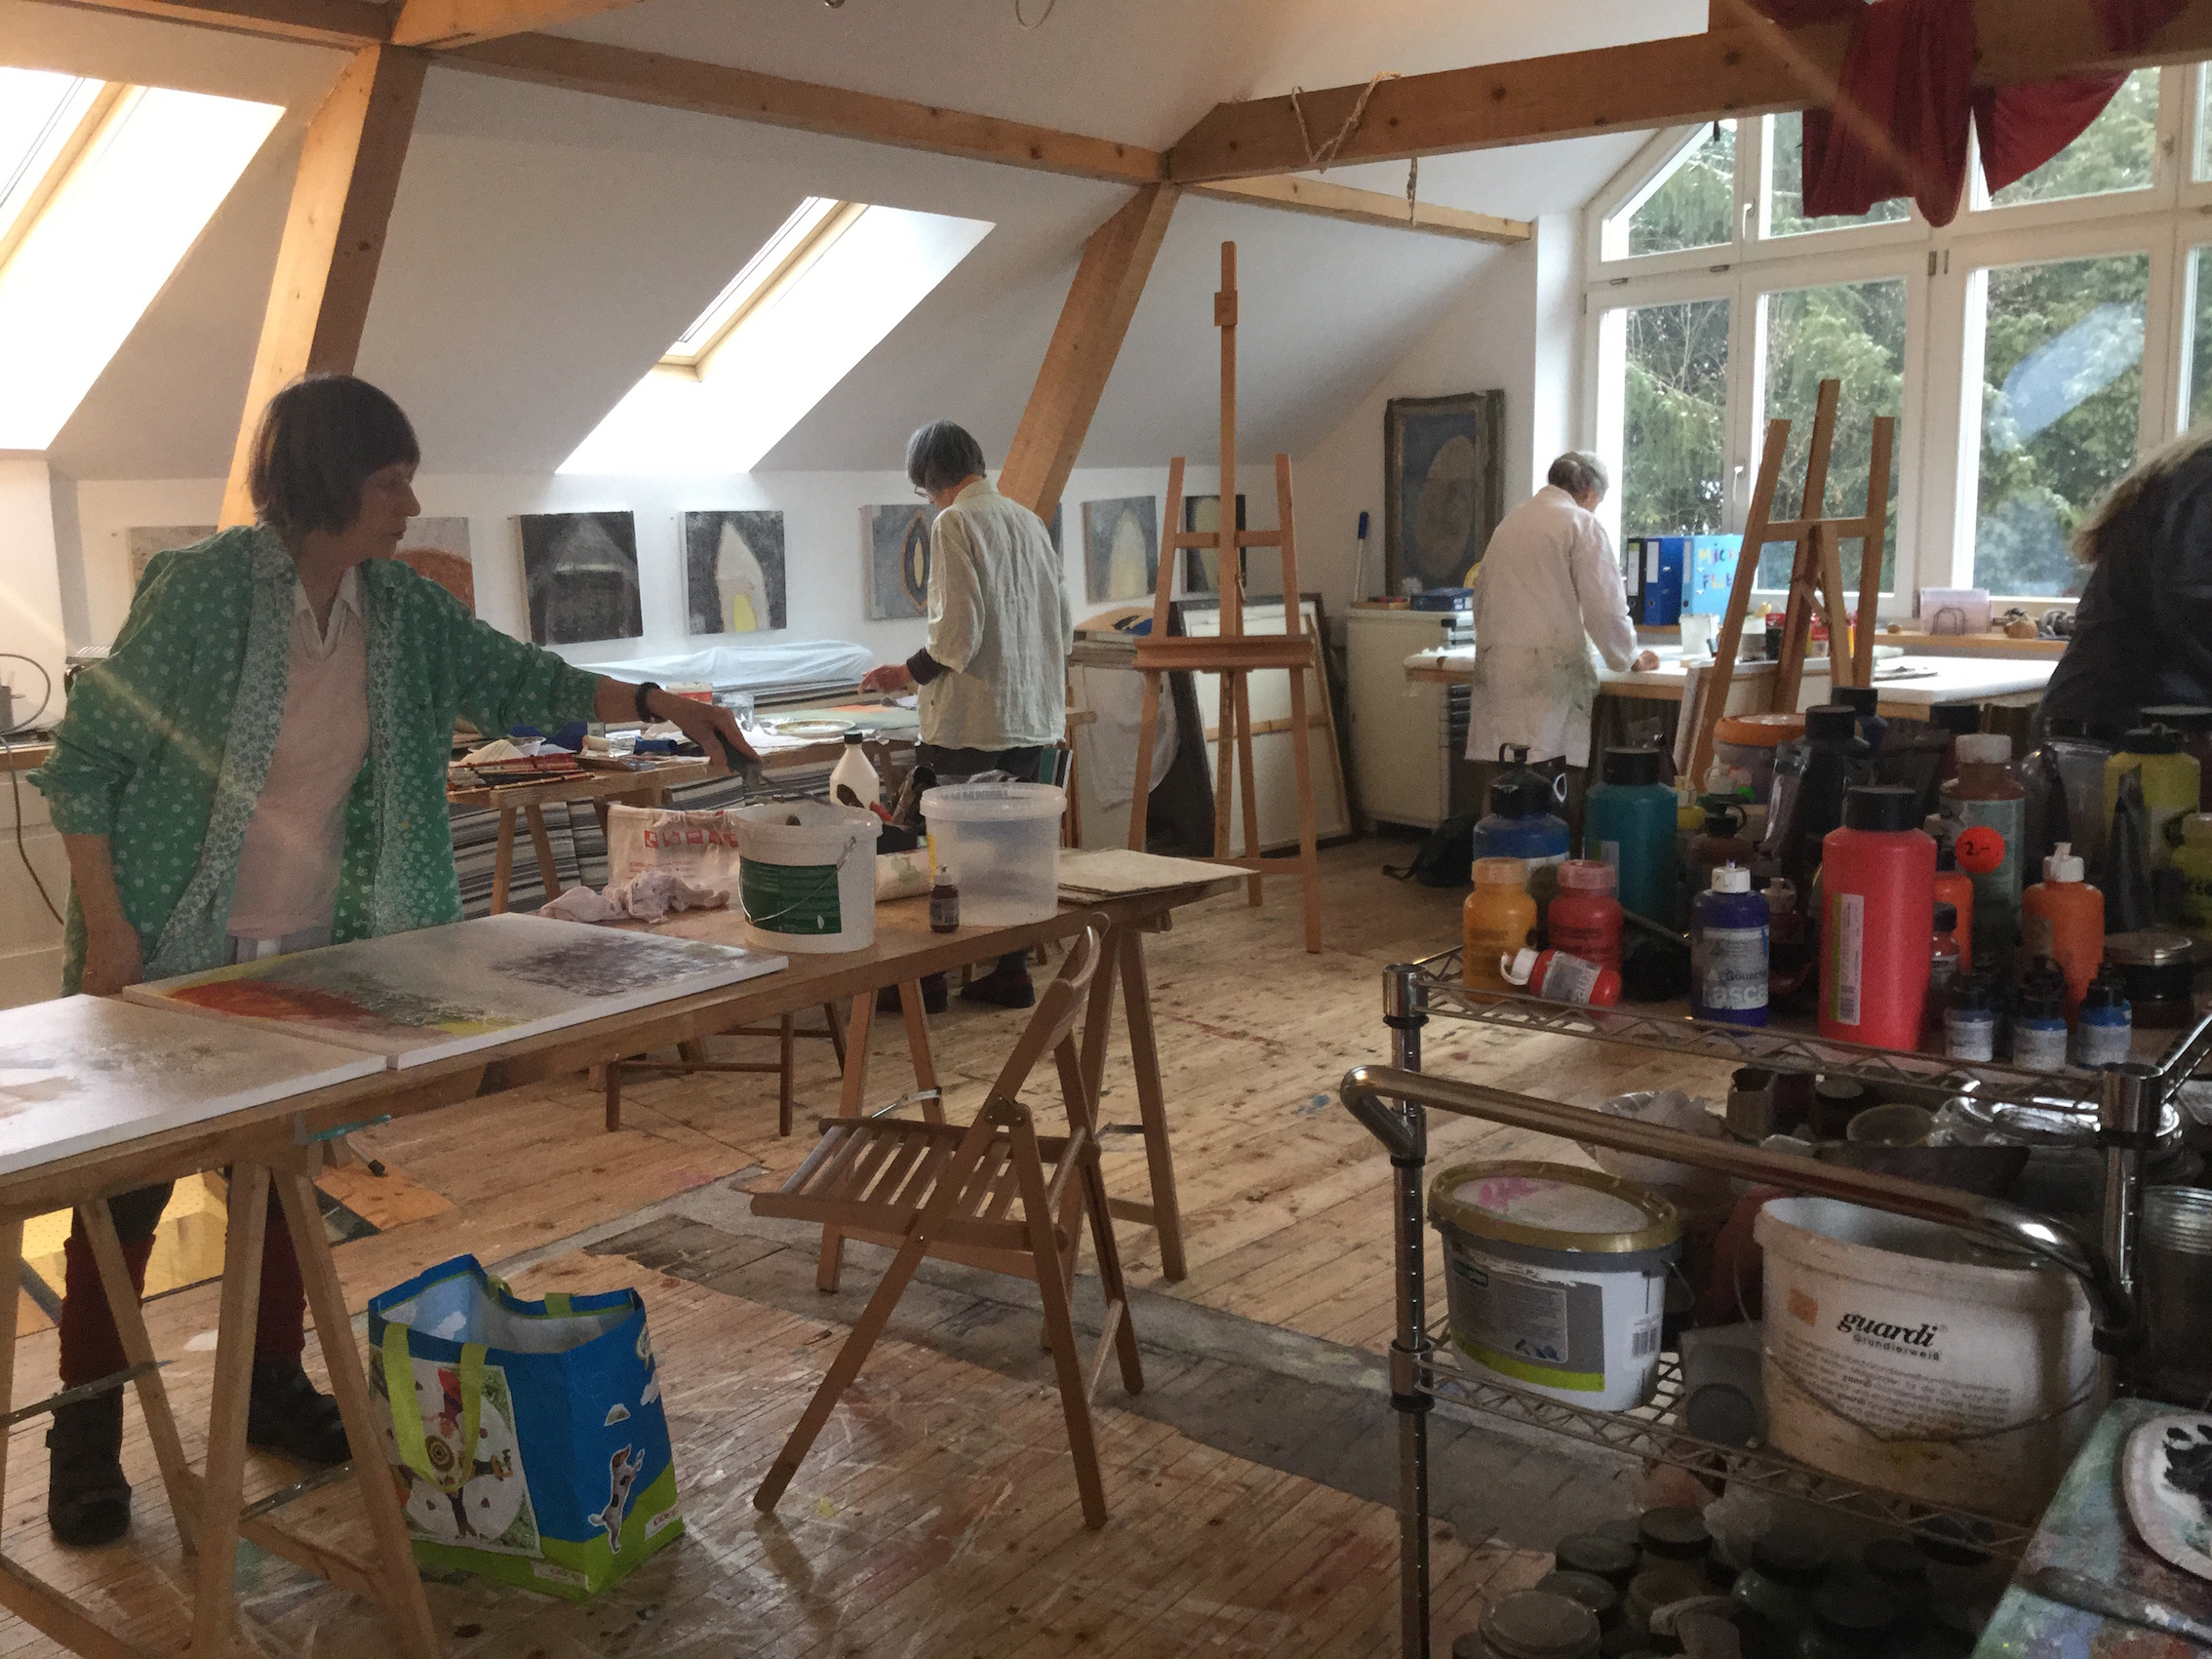 Malkurse im atelier arteprofundis - Atelier 154 ...